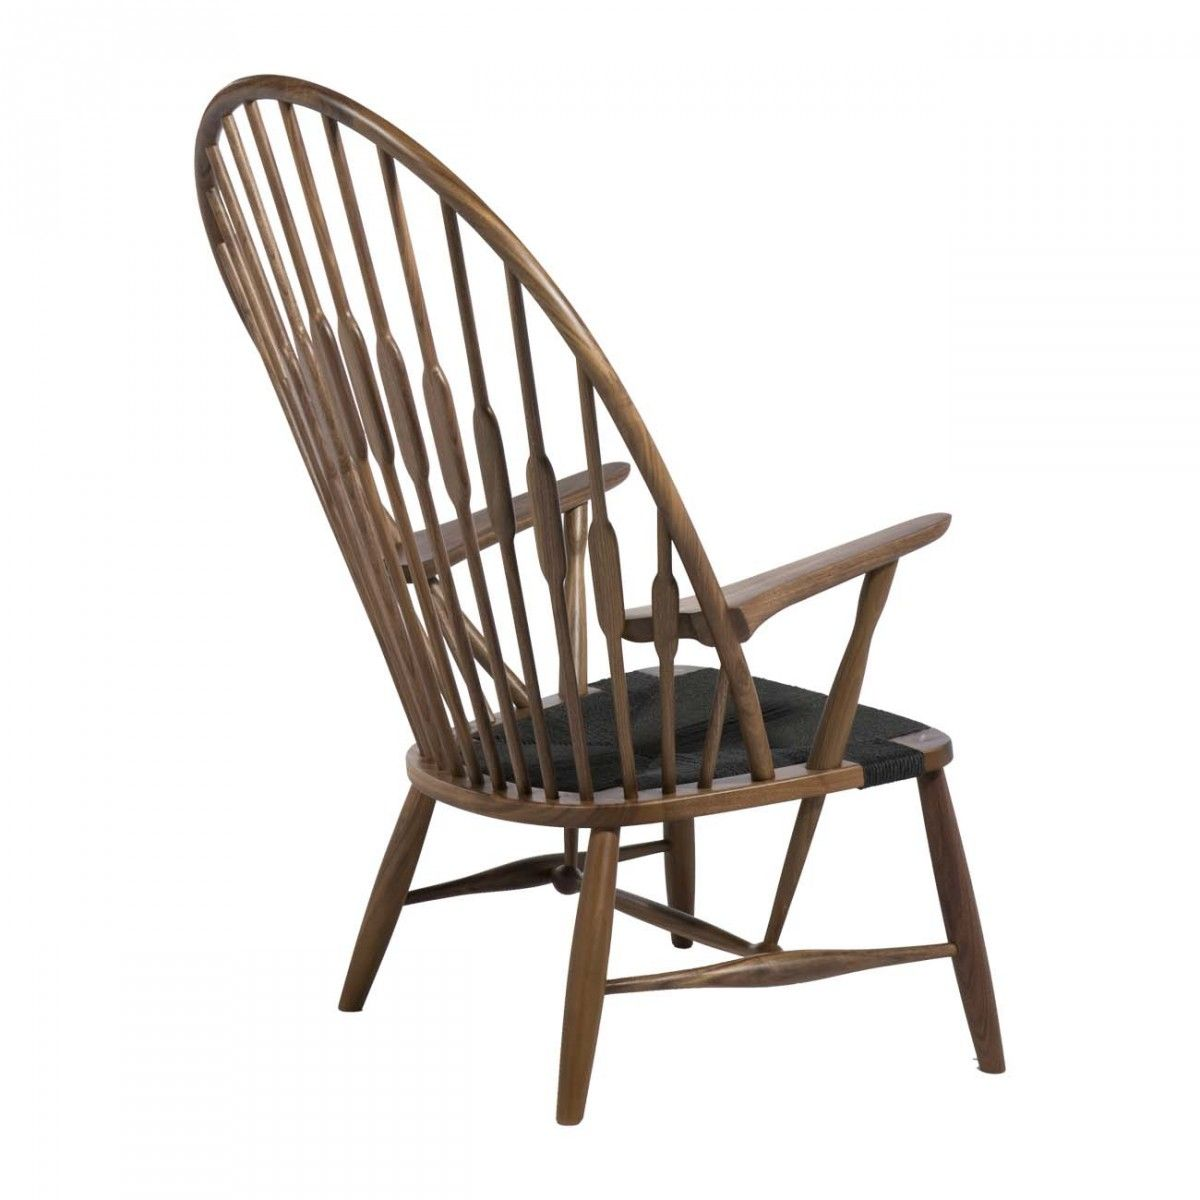 hans wegner peacock chair. Peacock Chair, Hans Wegner Chair